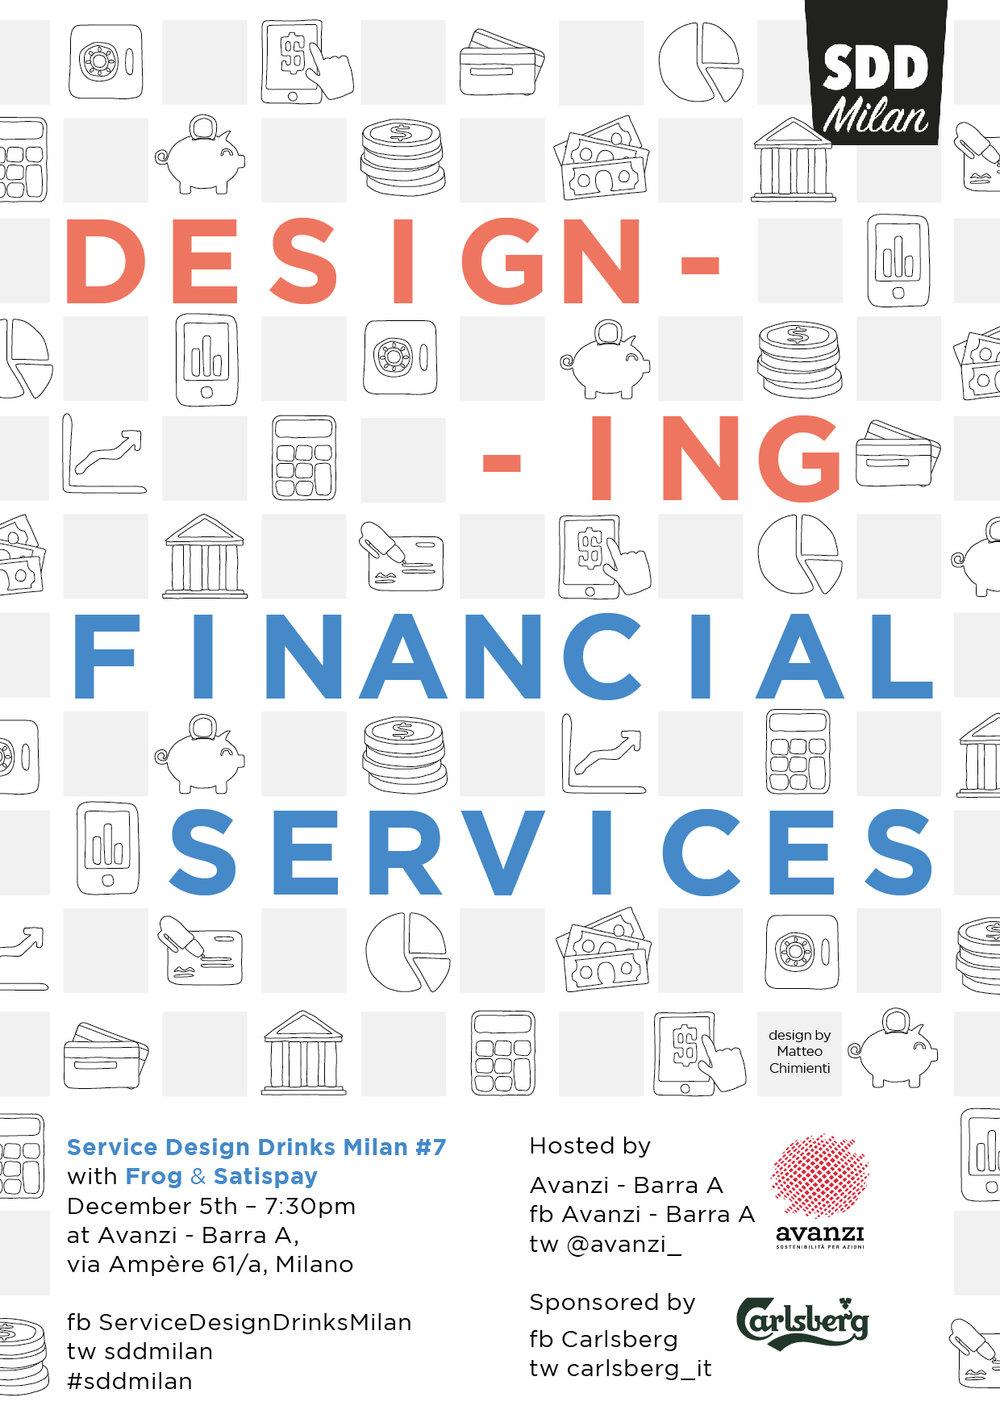 Service Design Drinks Milan #7 - Designing Finacial Services.jpg